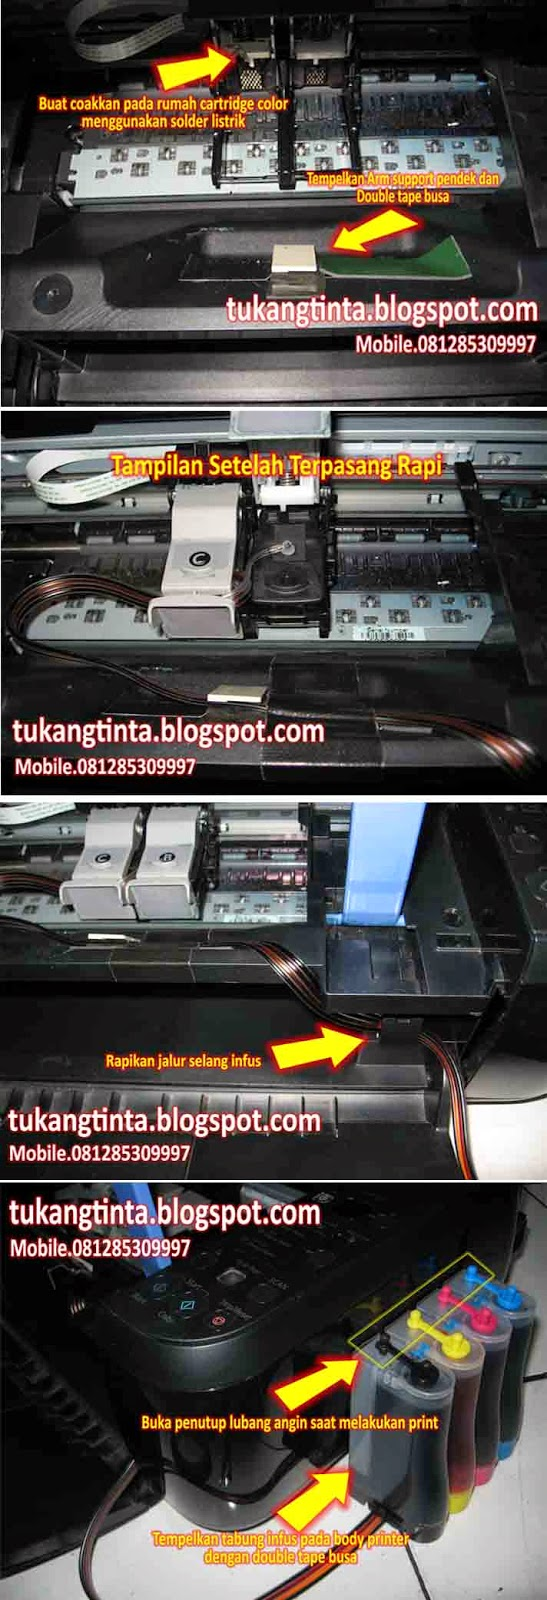 Pusat Modifikasi Printer Infus Cara Pasang Instalasi Selang 4 Jalur Http Step 2 Lanjut Pada Body Depan